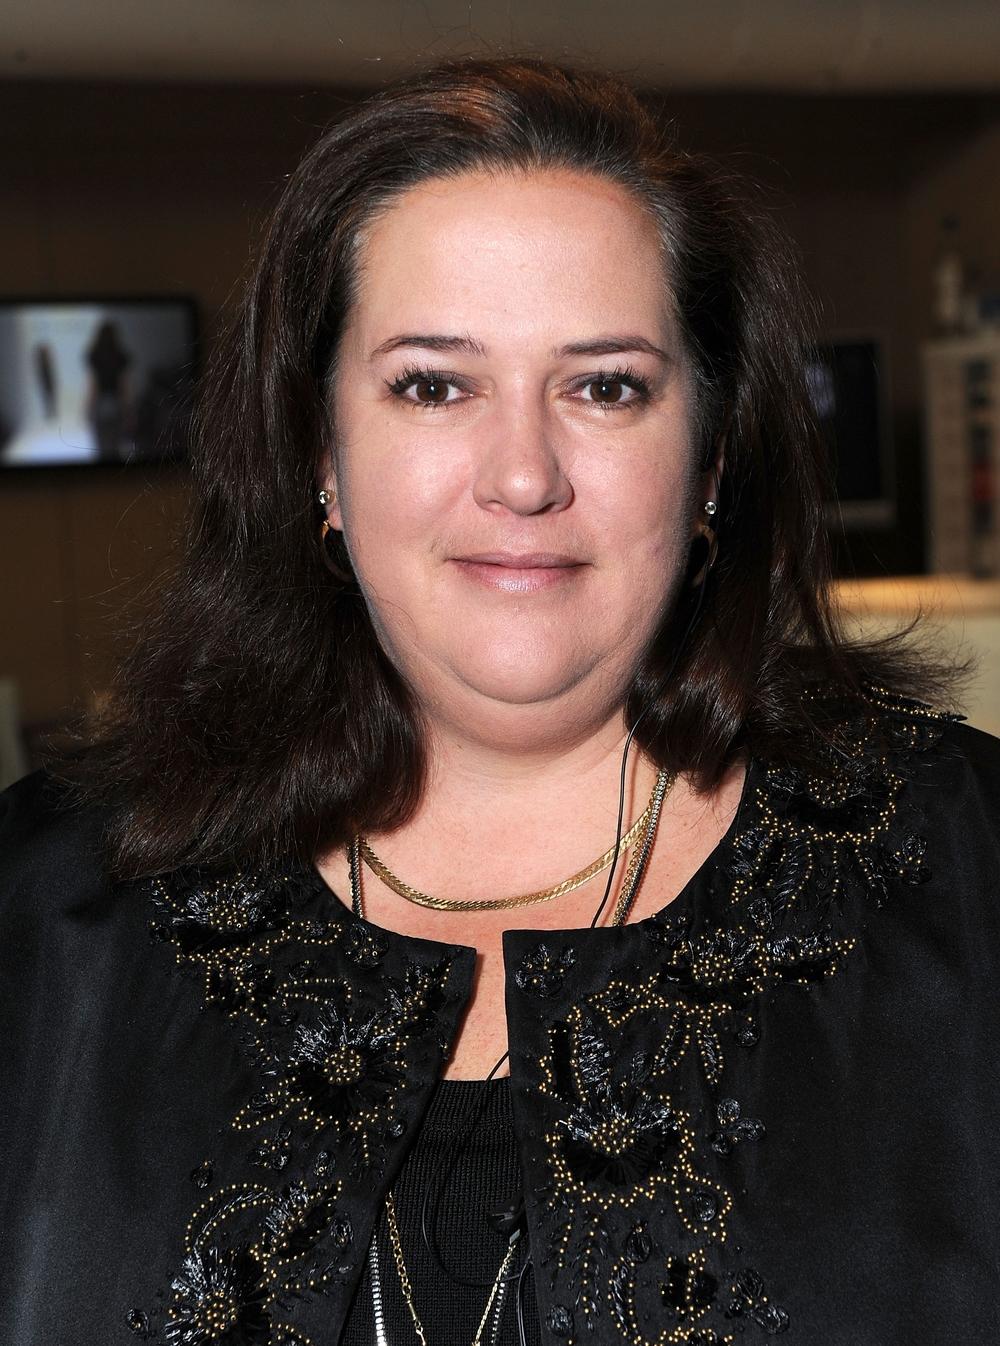 Christina Neault